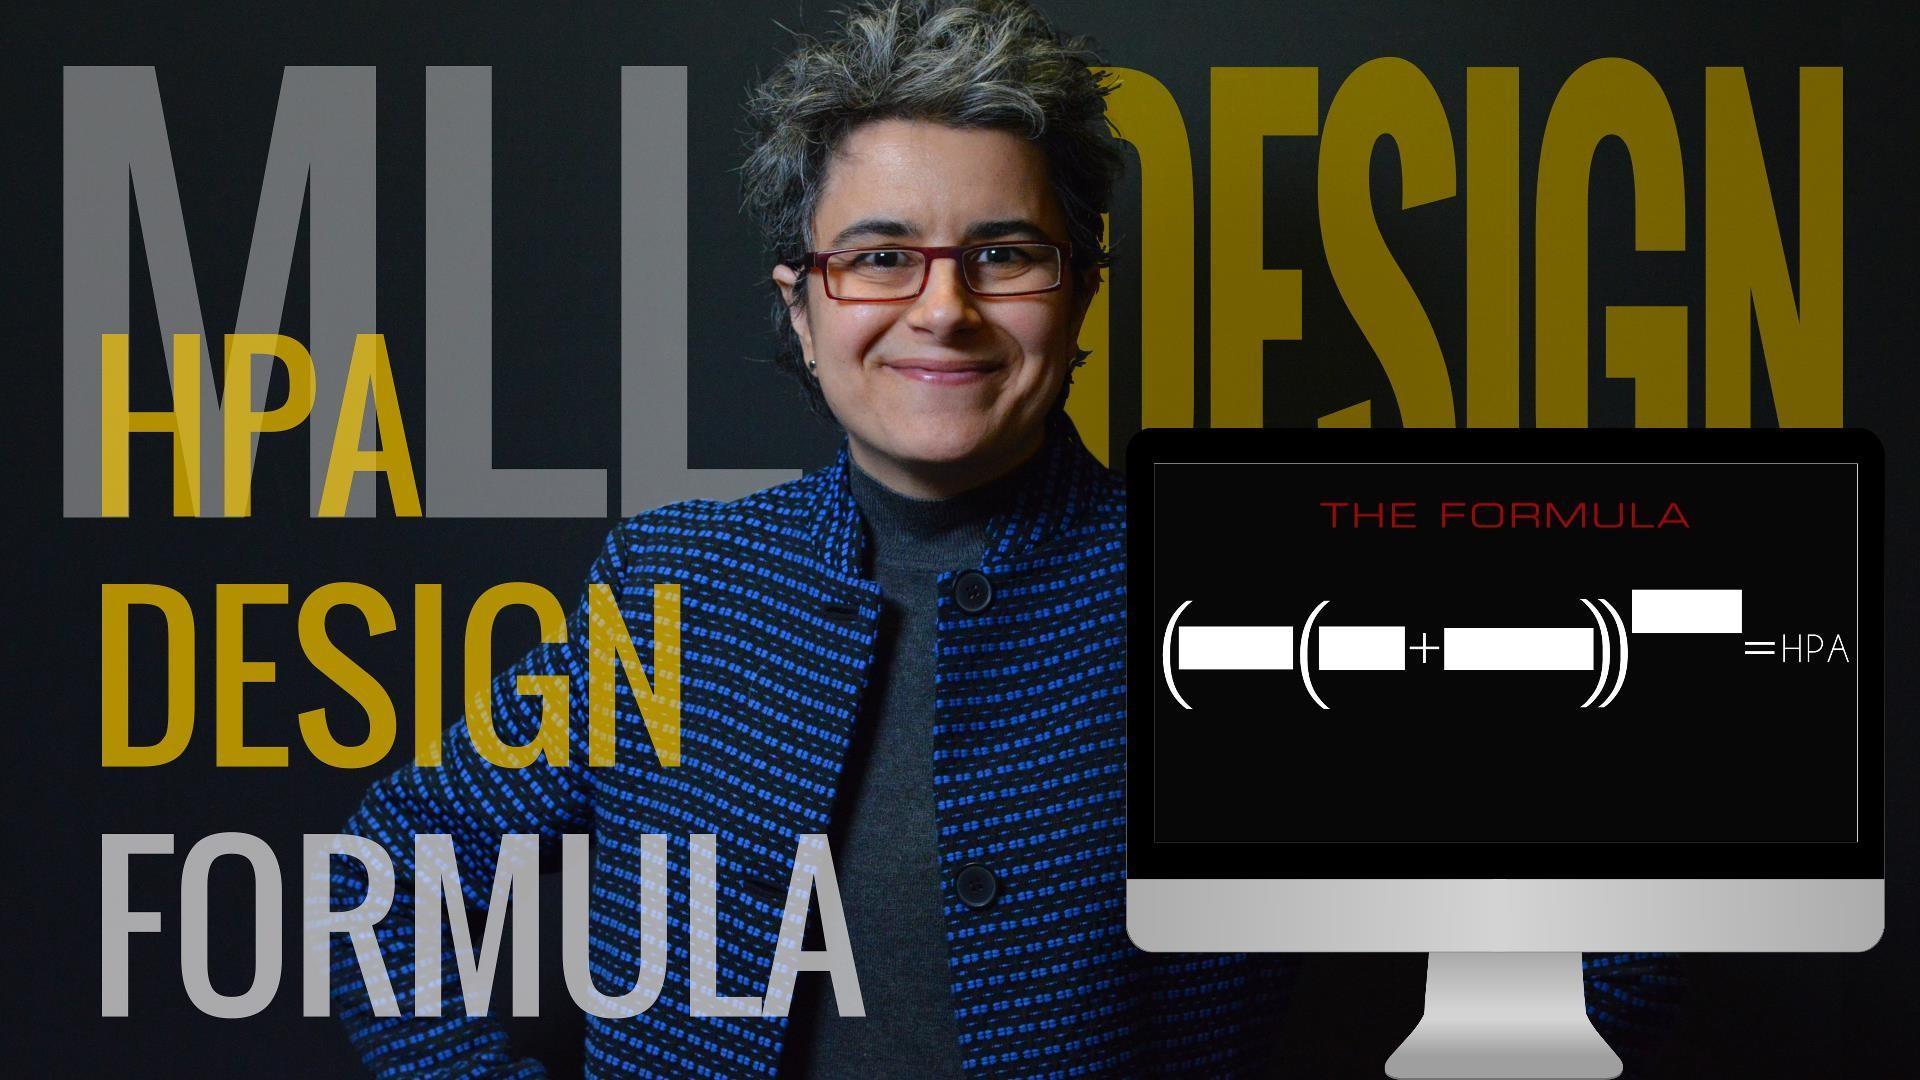 HPA Design Formula Presentation